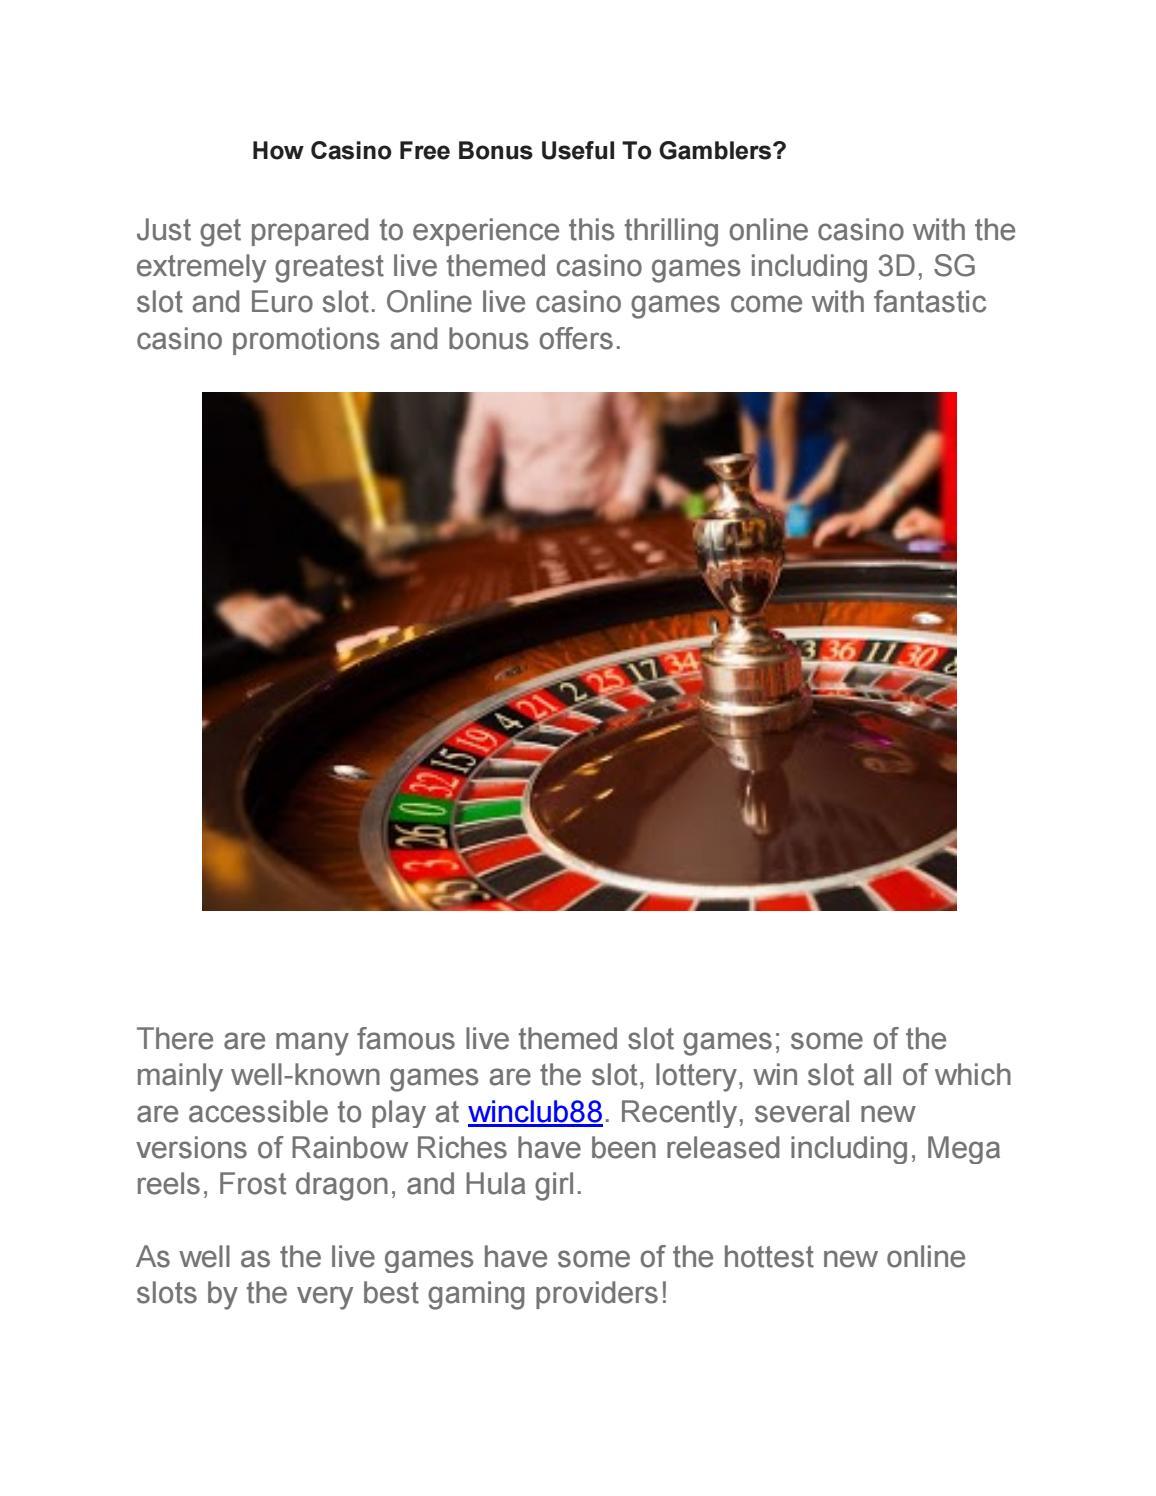 How Casino Free Bonus Useful To Gamblers By Win Club Issuu